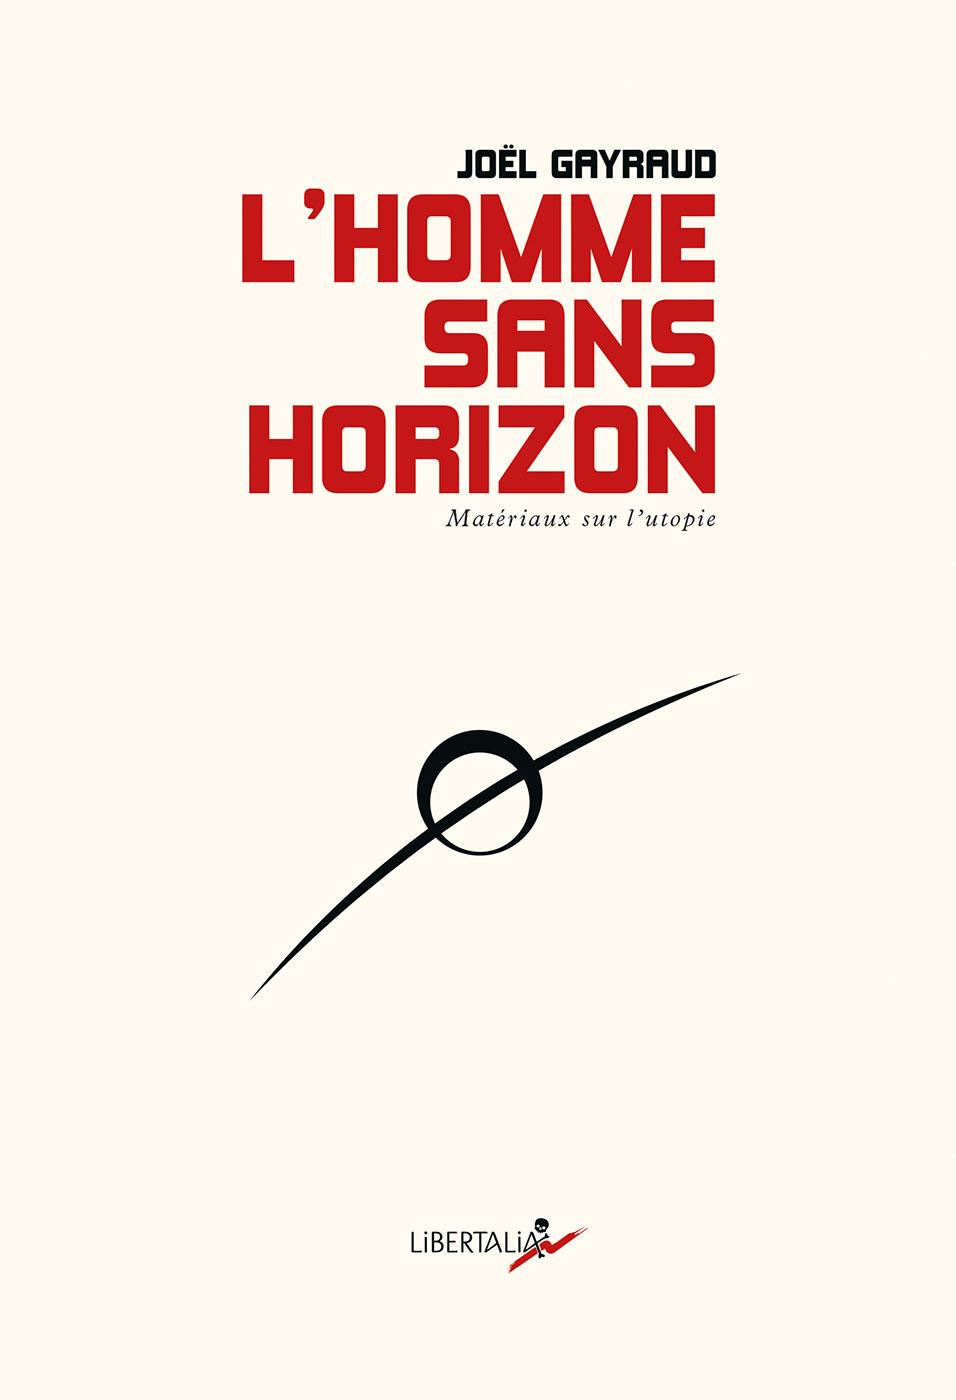 Joël GAYRAUD, L'HOMME SANS HORIZON, éditions LIBERTALIA, OCTOBRE 2019